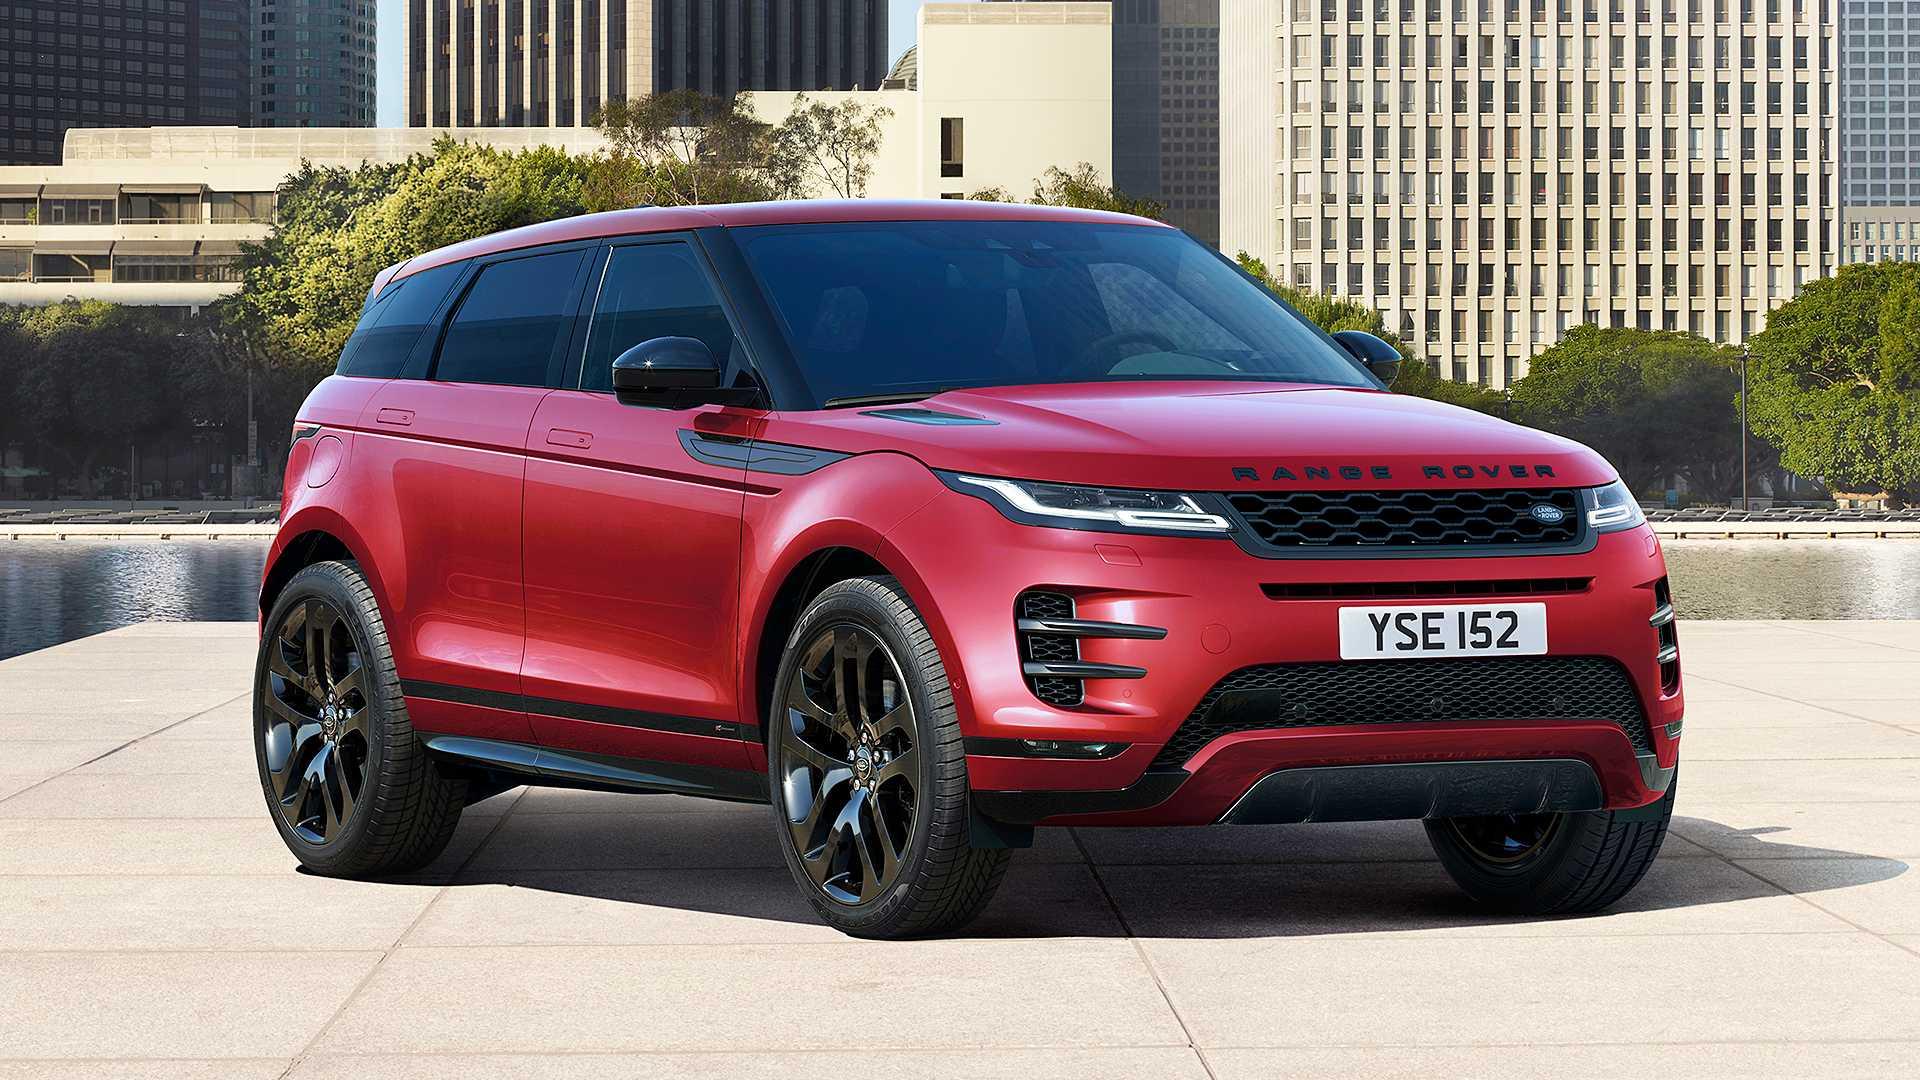 2020-range-rover-evoque (73)